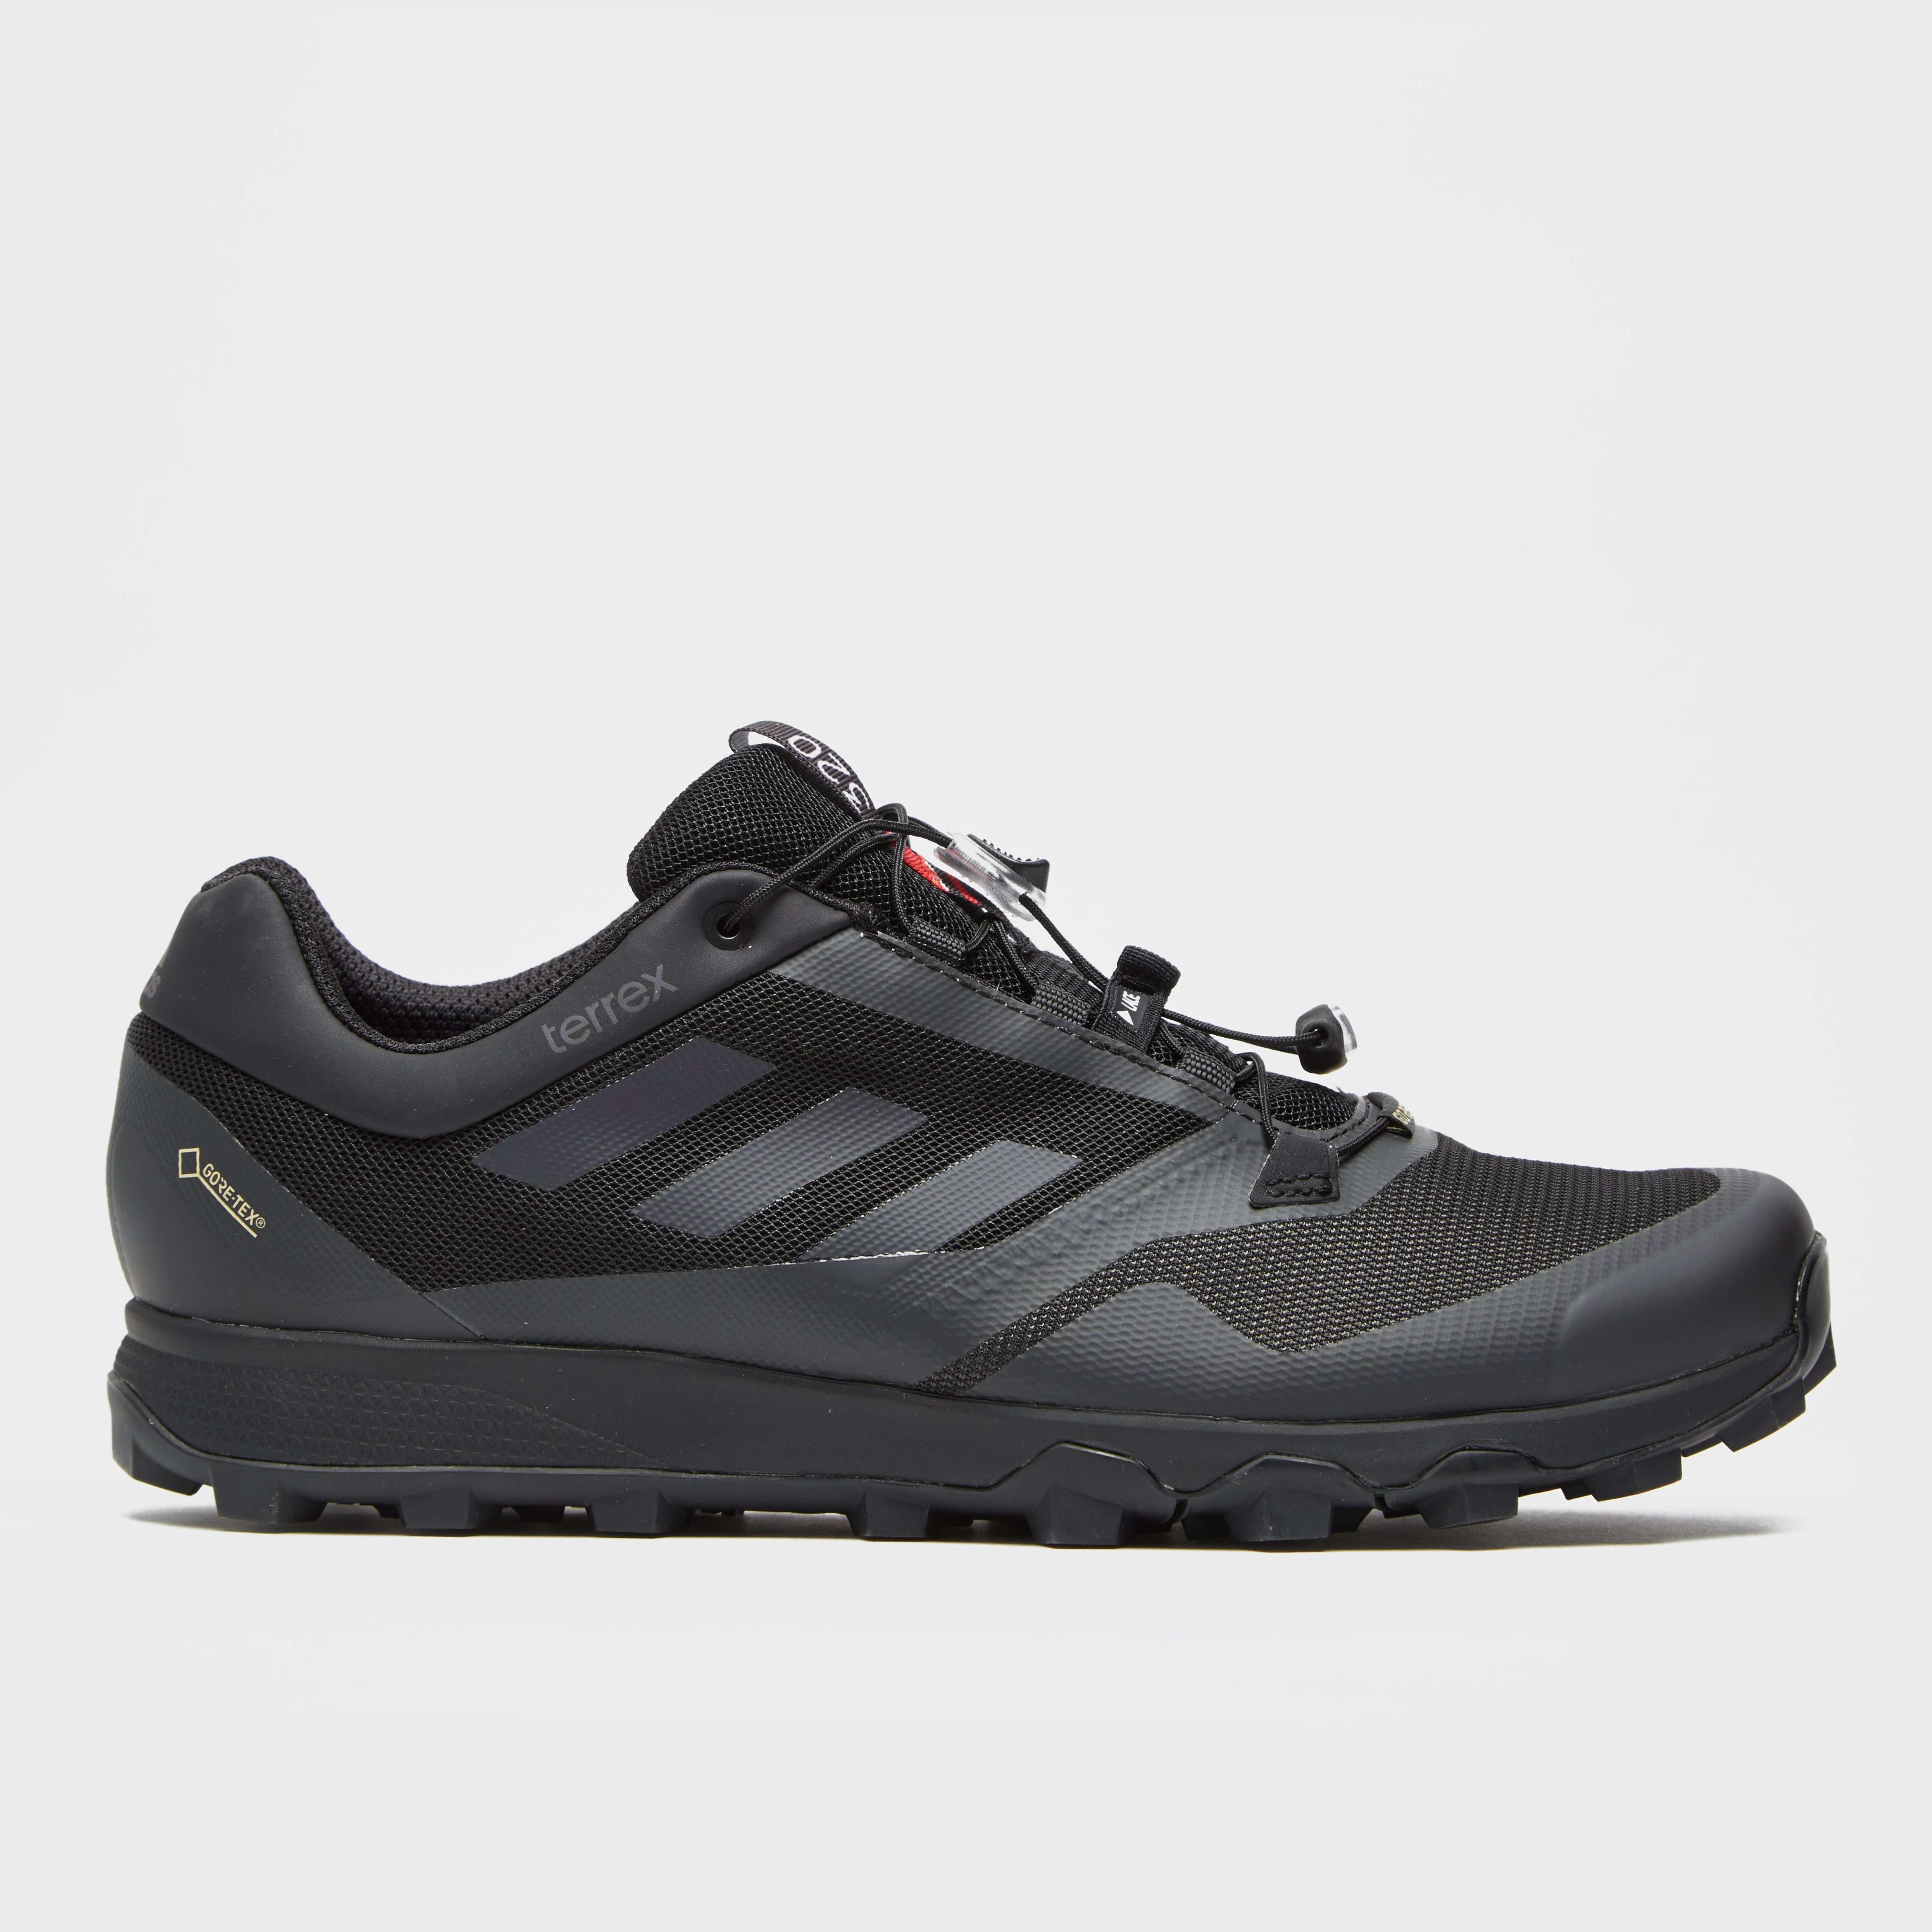 ADIDAS Terrex Trailmaker GORE-TEX® Trail Shoe